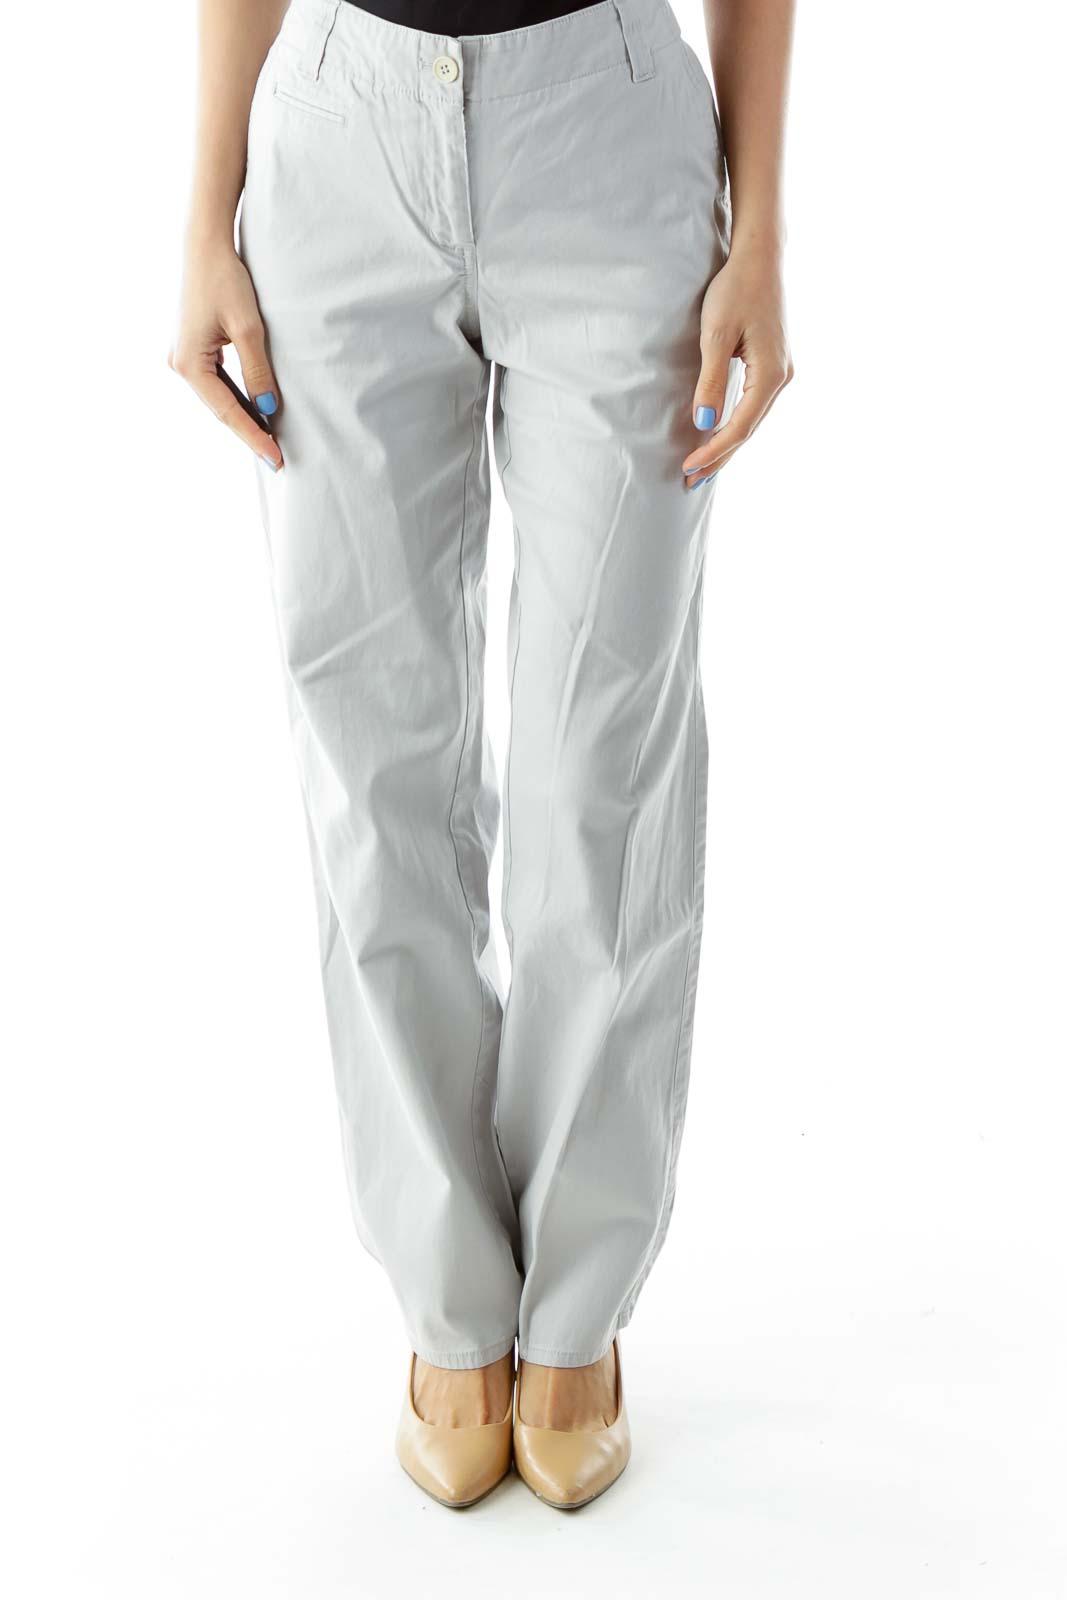 Gray Denim Boyfriend Jeans Front